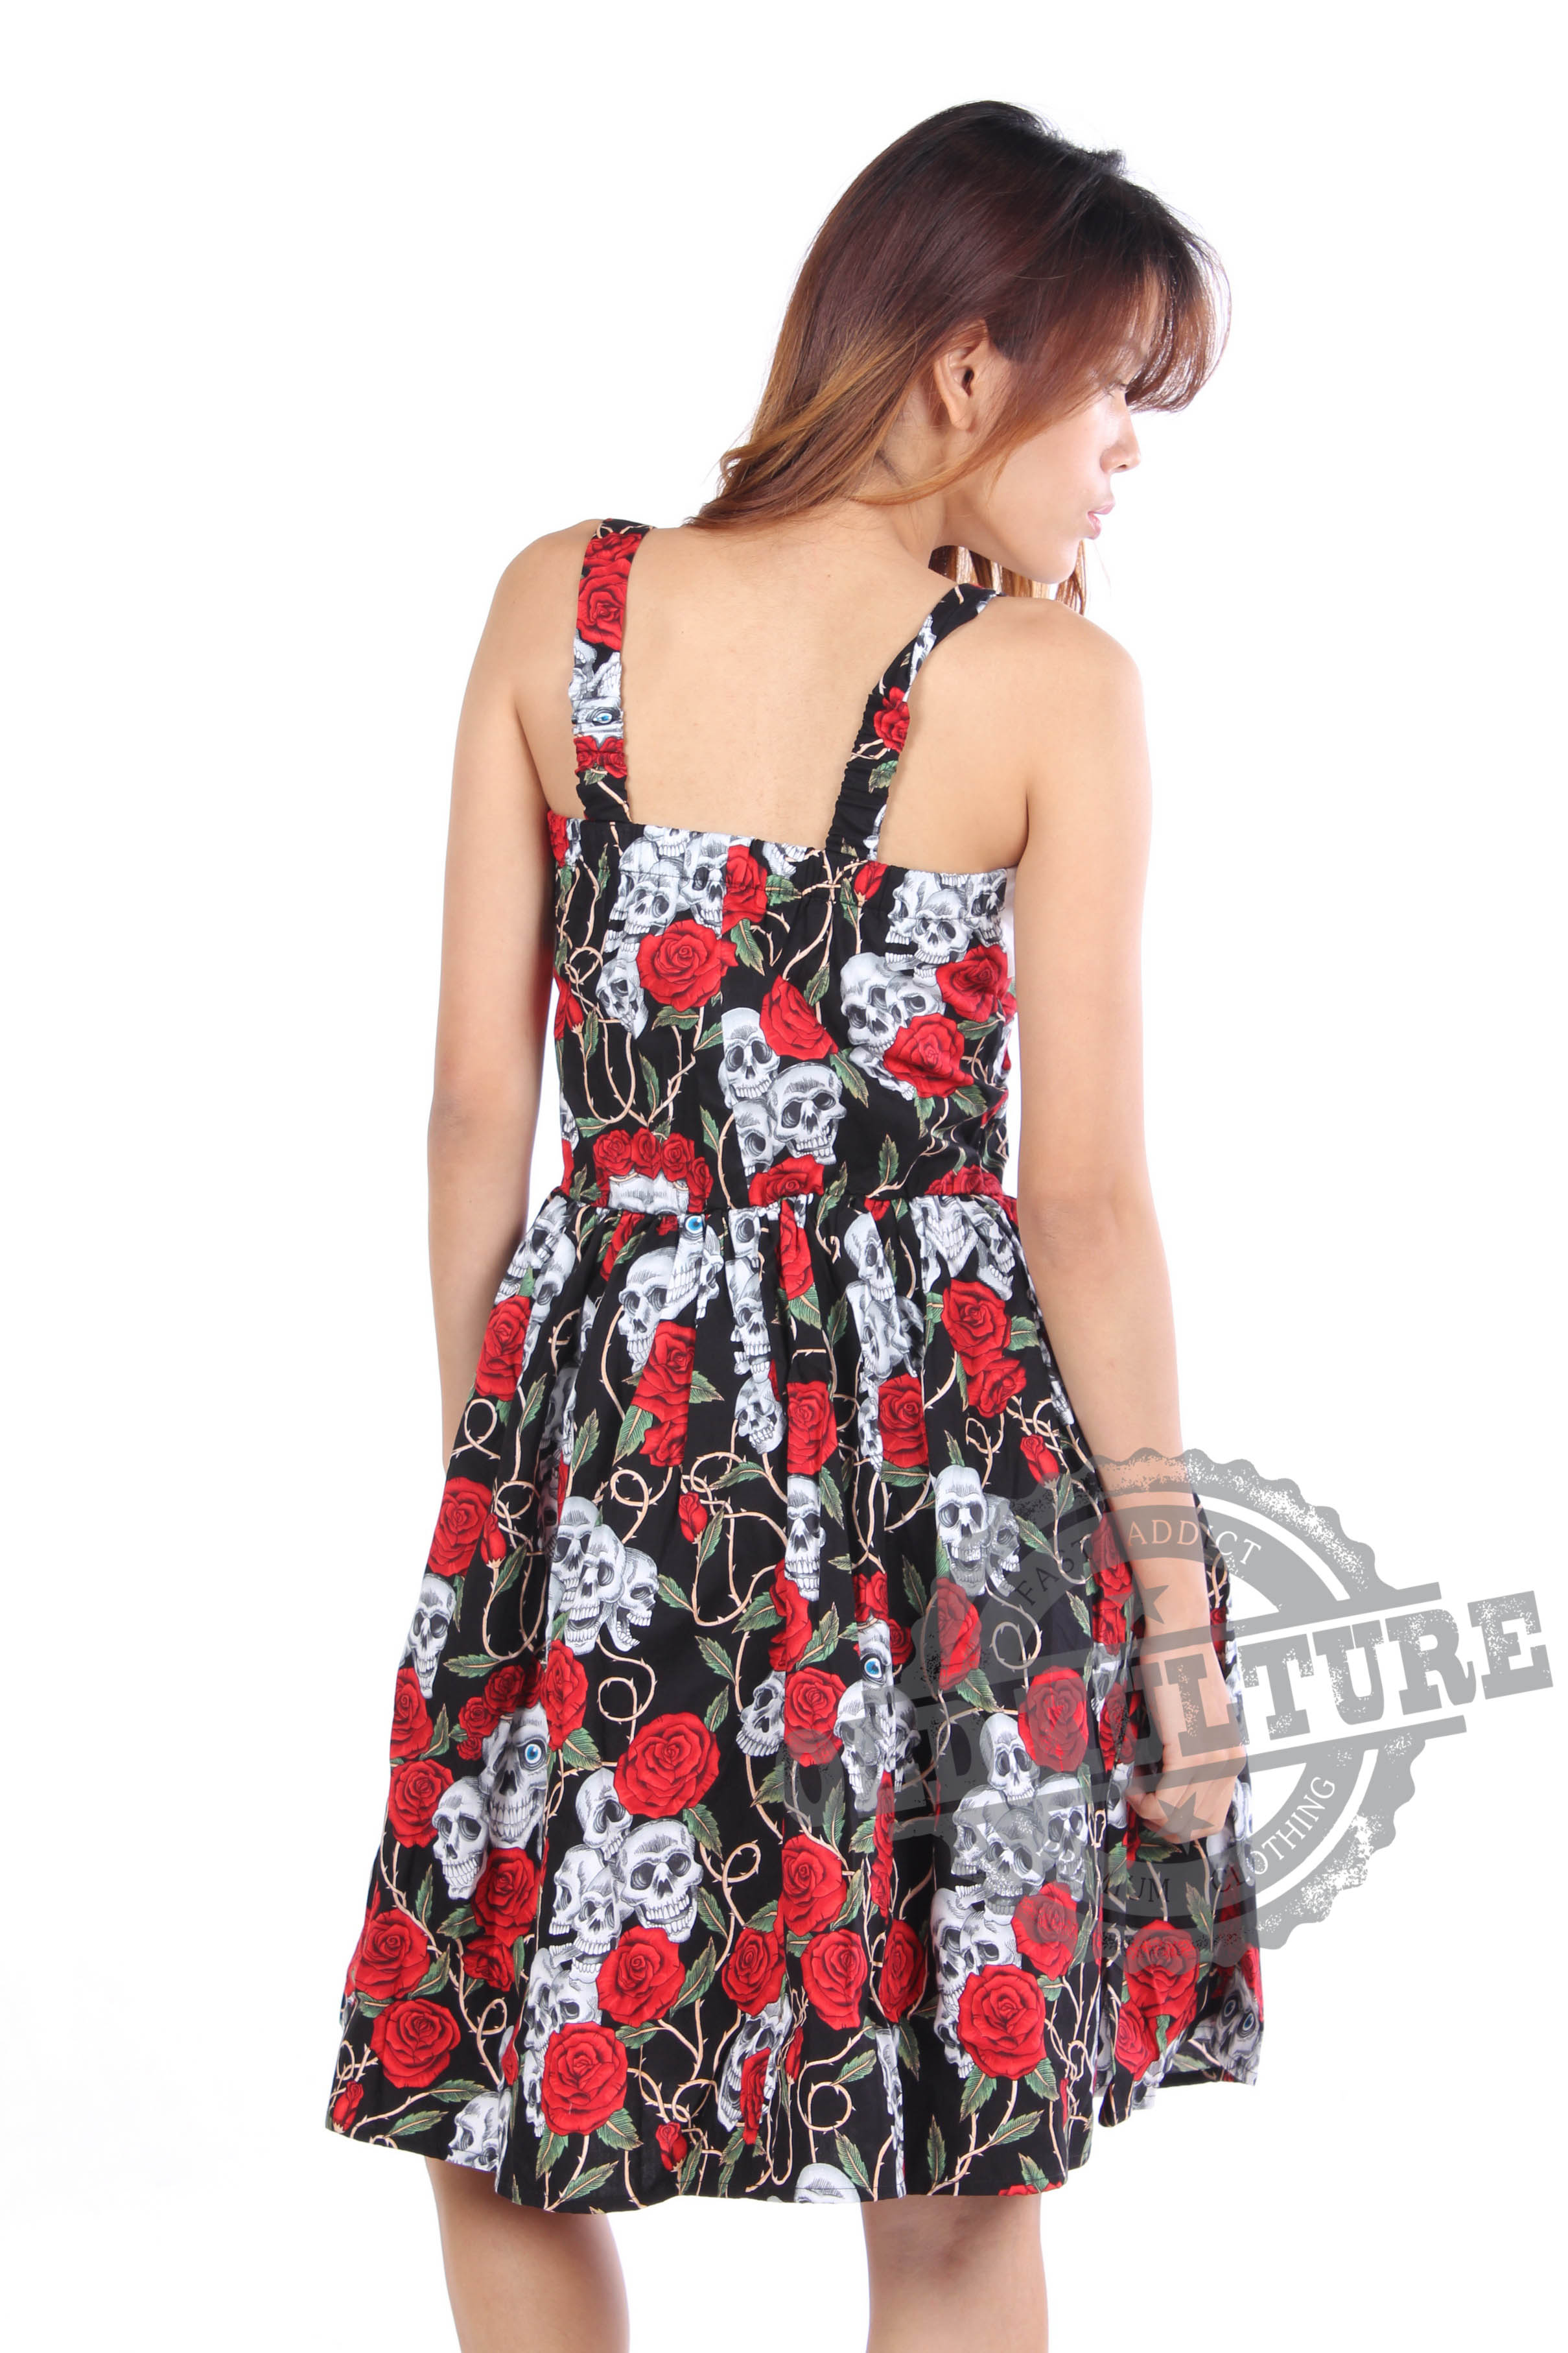 rockabilly_women_dress_skull_roses_retro_vintage_pin_up_cocktail_prom_party_unique_design_d23_dresses_2.JPG